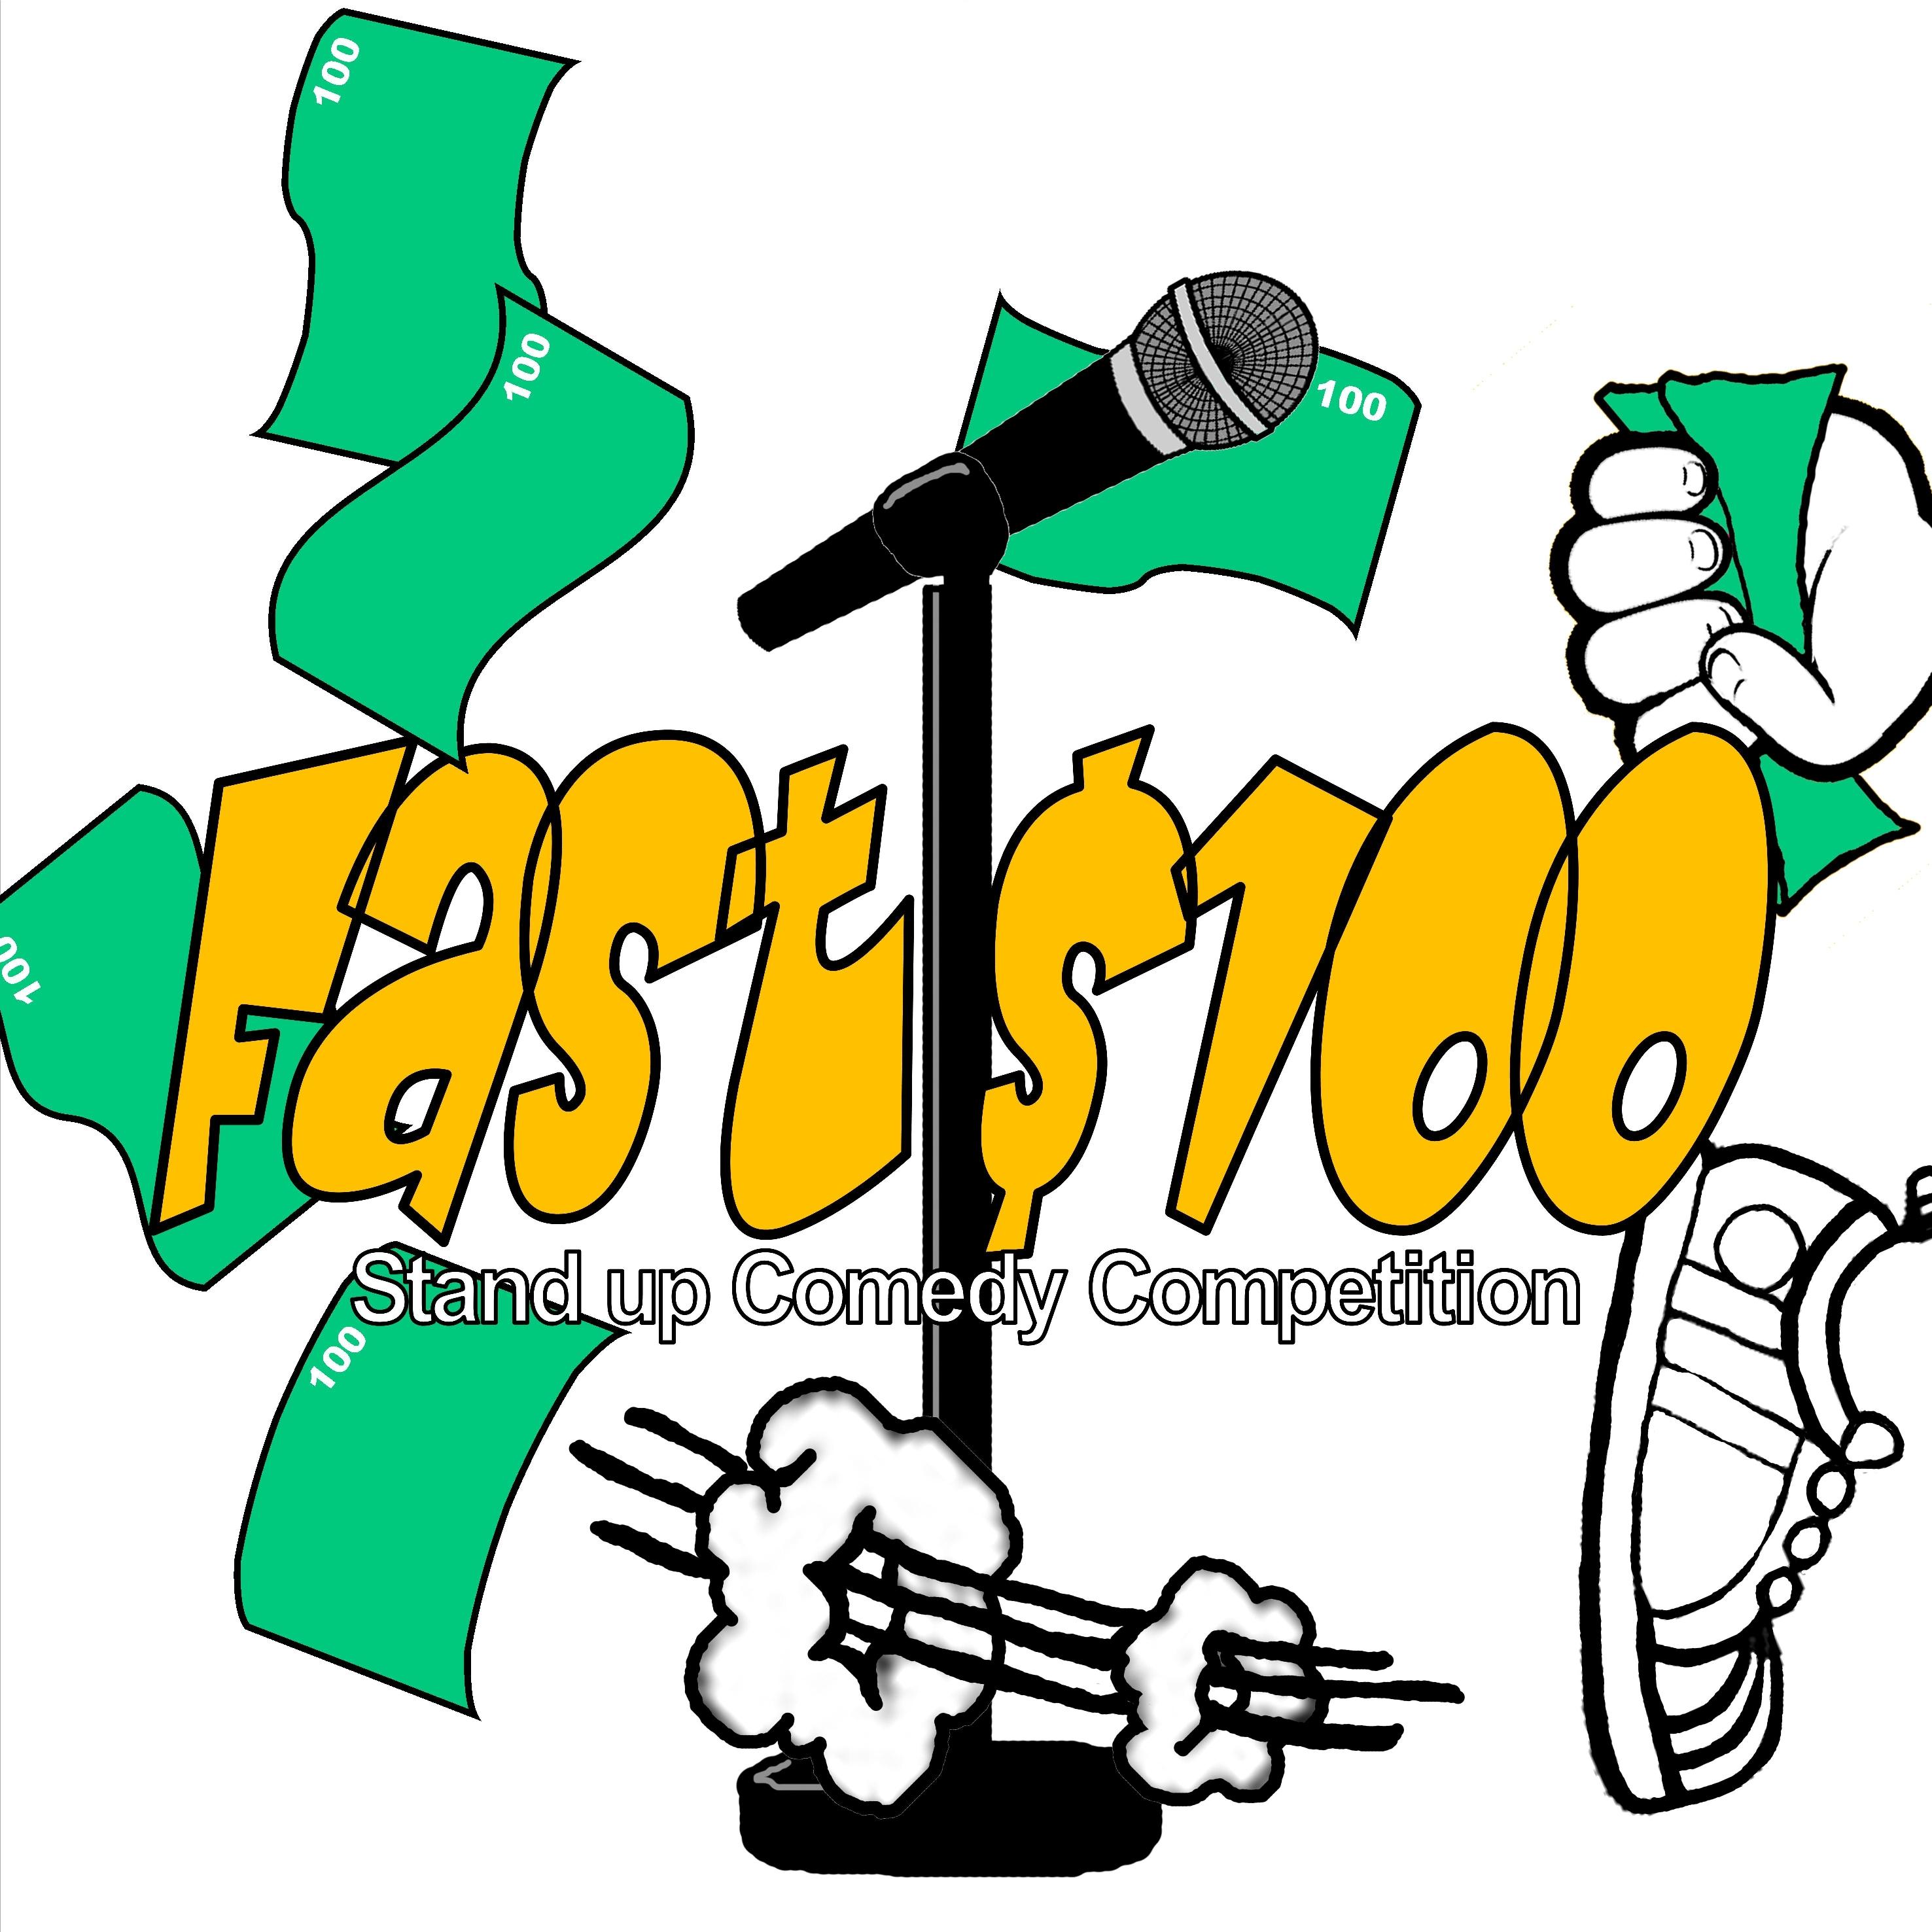 Bonkerz- Fast $100 Comedy Comp